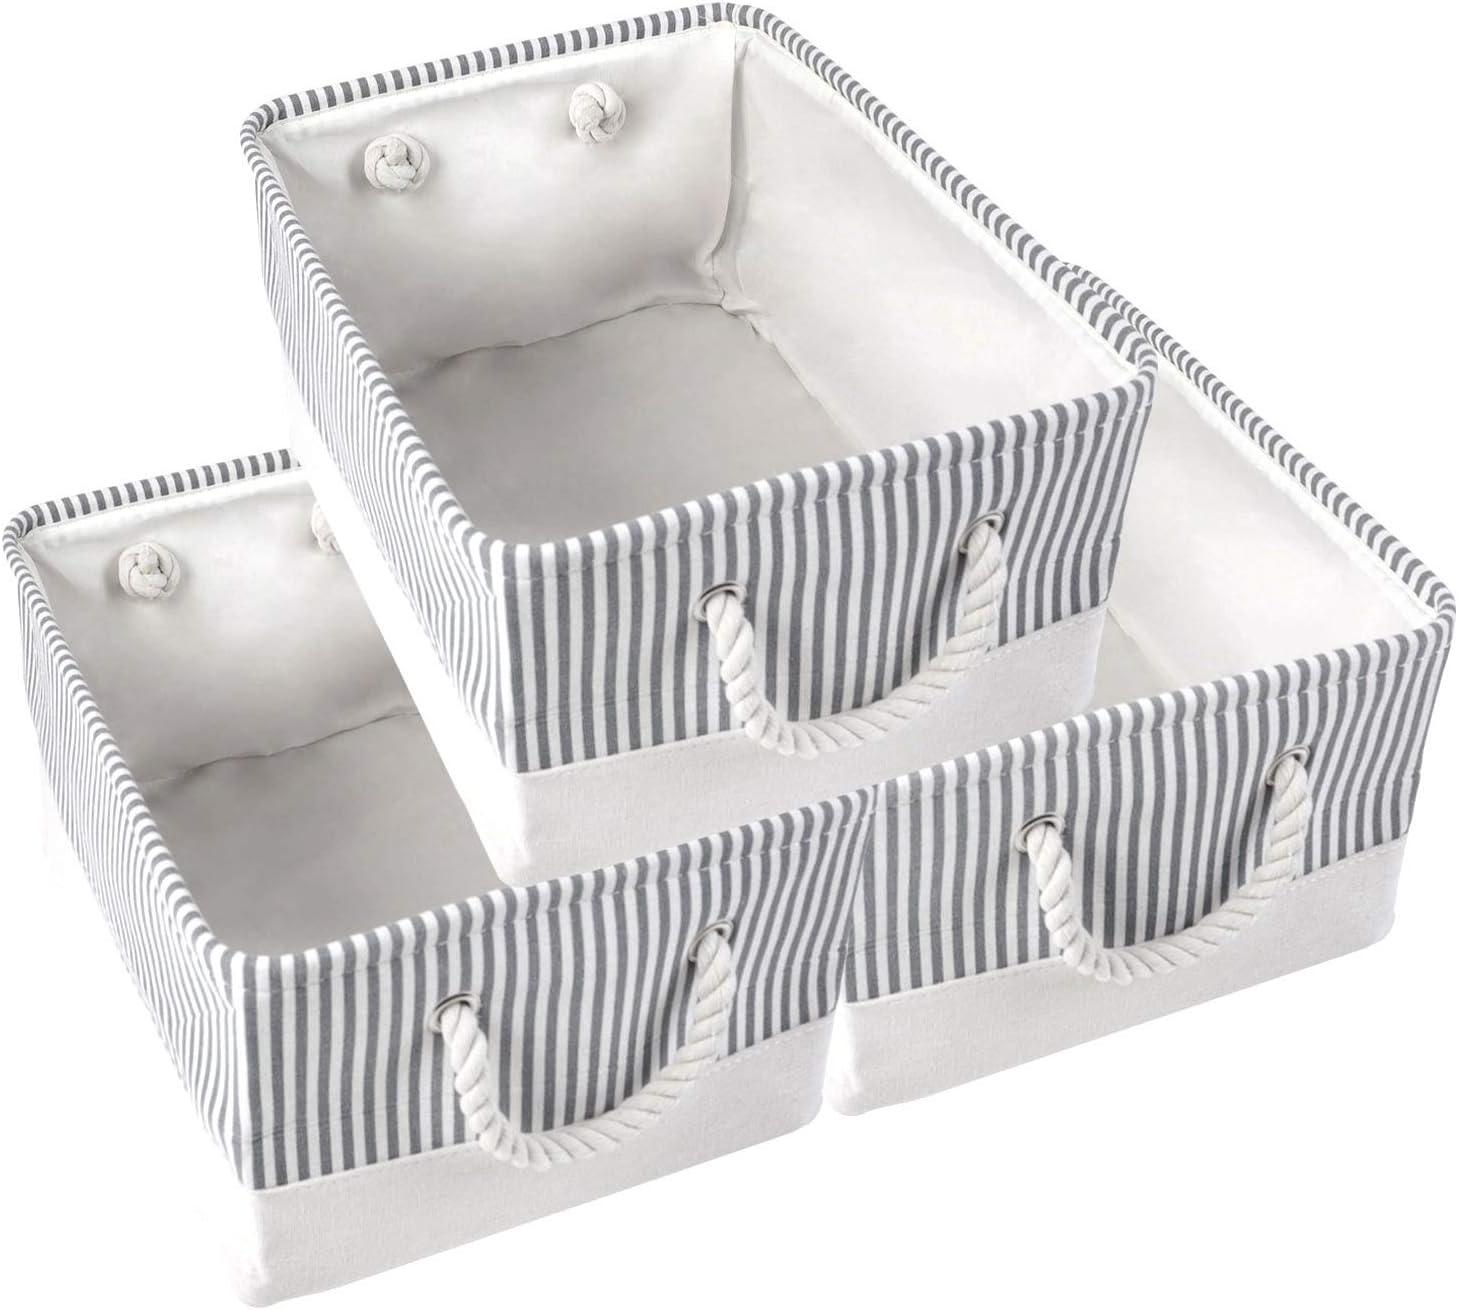 ANMINY 3PCS Storage Baskets Set Max 61% OFF B Foldable unisex Canvas Stripe